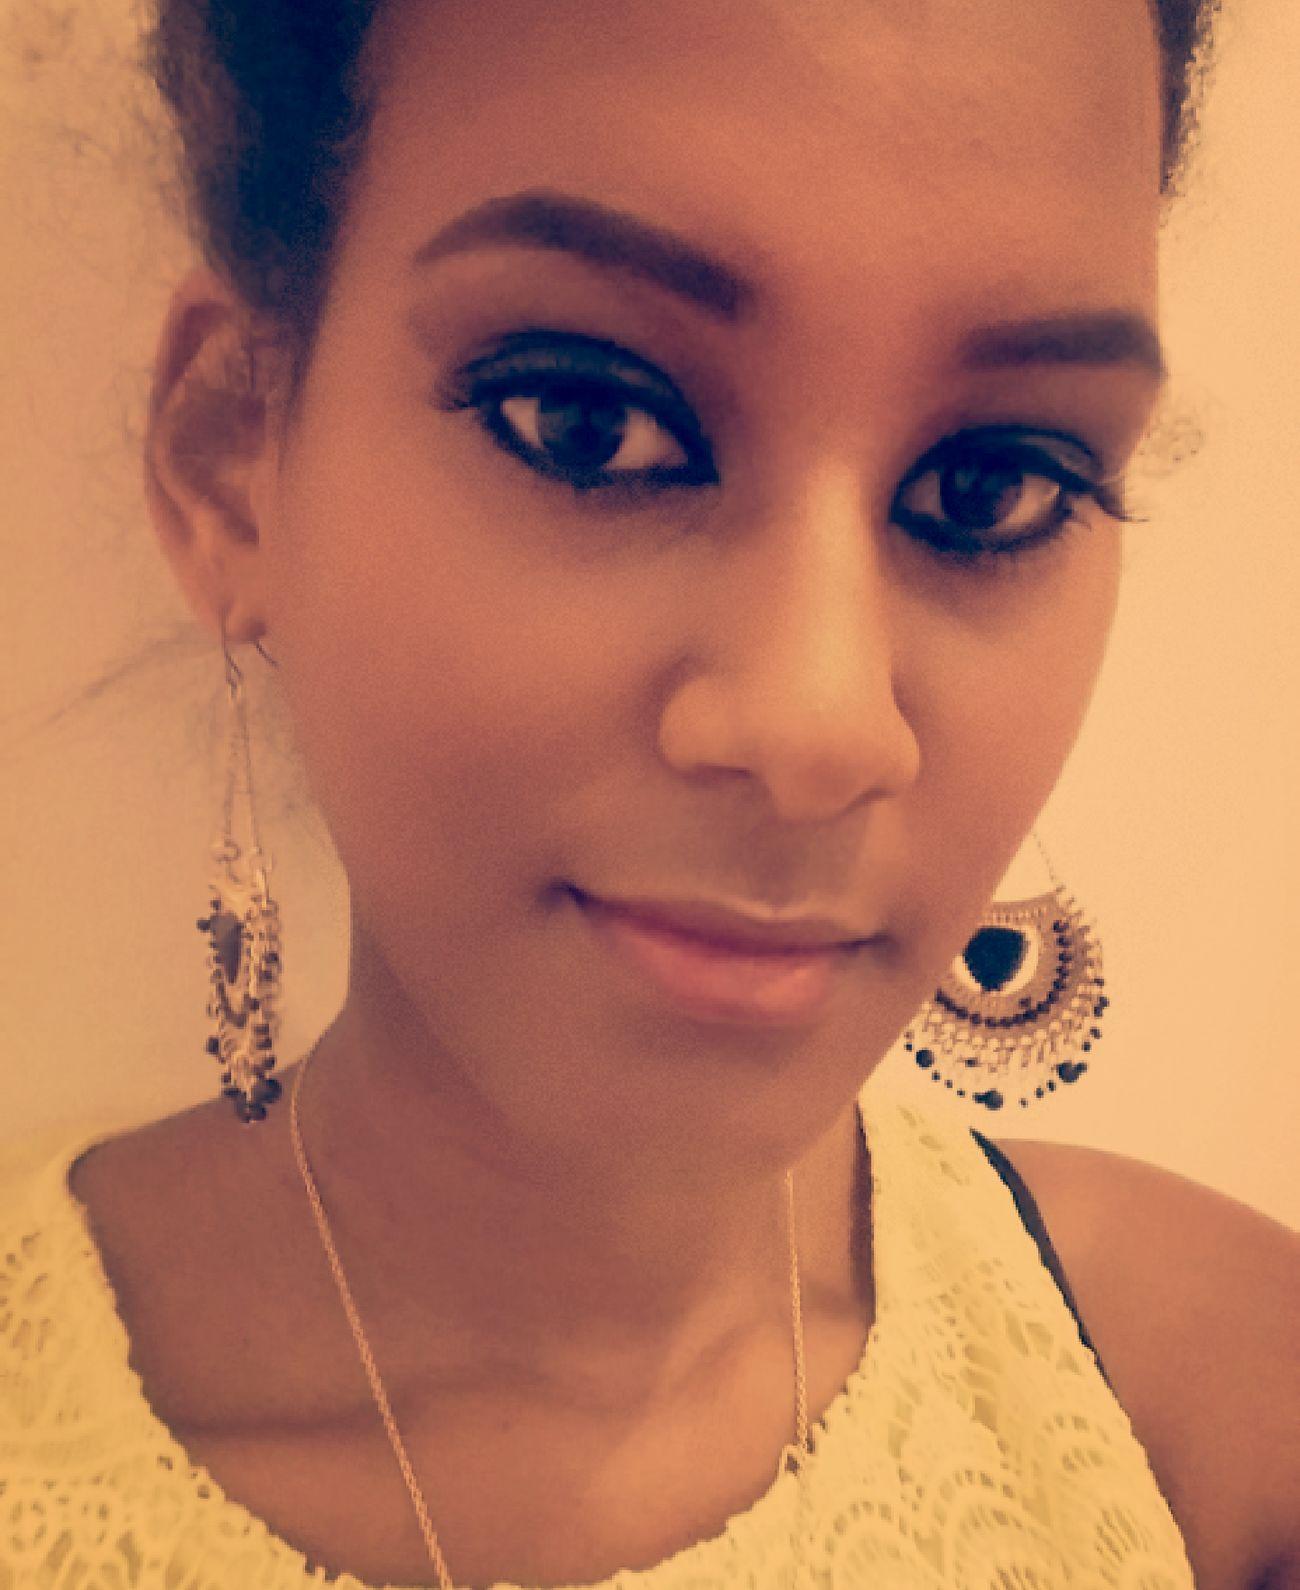 Selfie Follow_me Curly Hair Blackgirl Beauty Smokey Eyes Picoftheday That's Me Happy